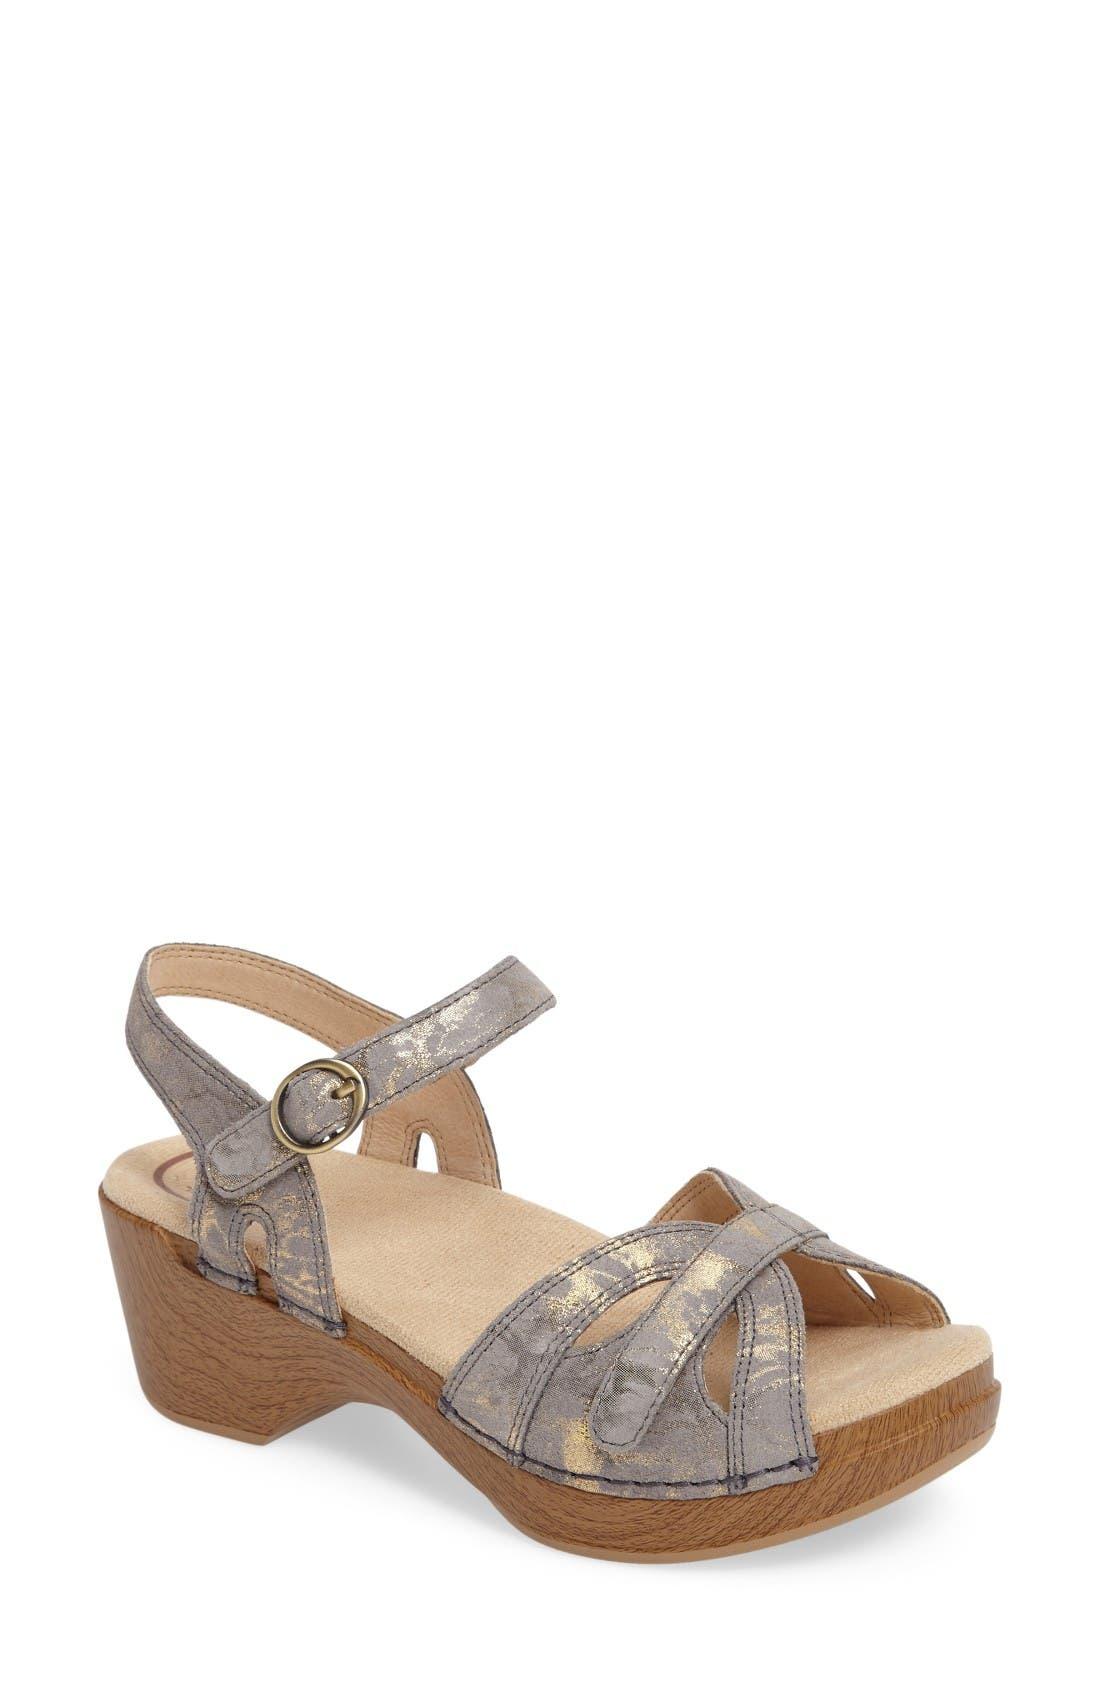 Season Sandal,                         Main,                         color, Stone Leather